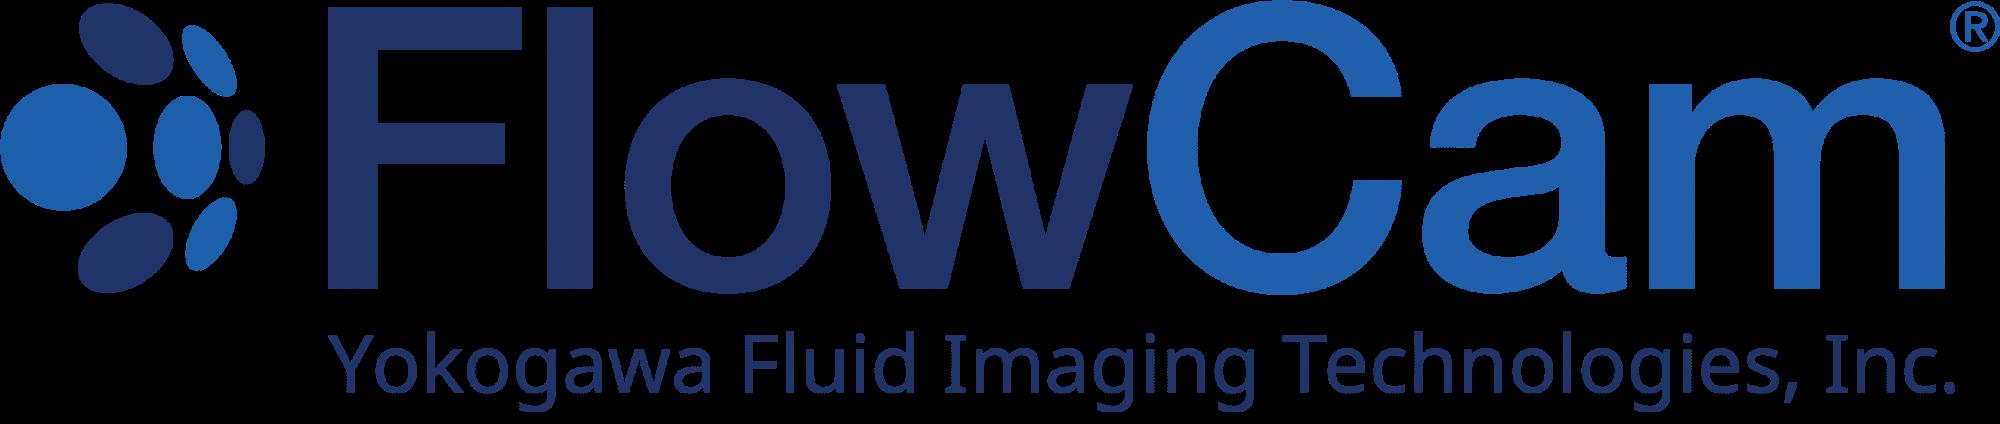 Yokogawa Fluid Imaging Technologies, Inc. logo.